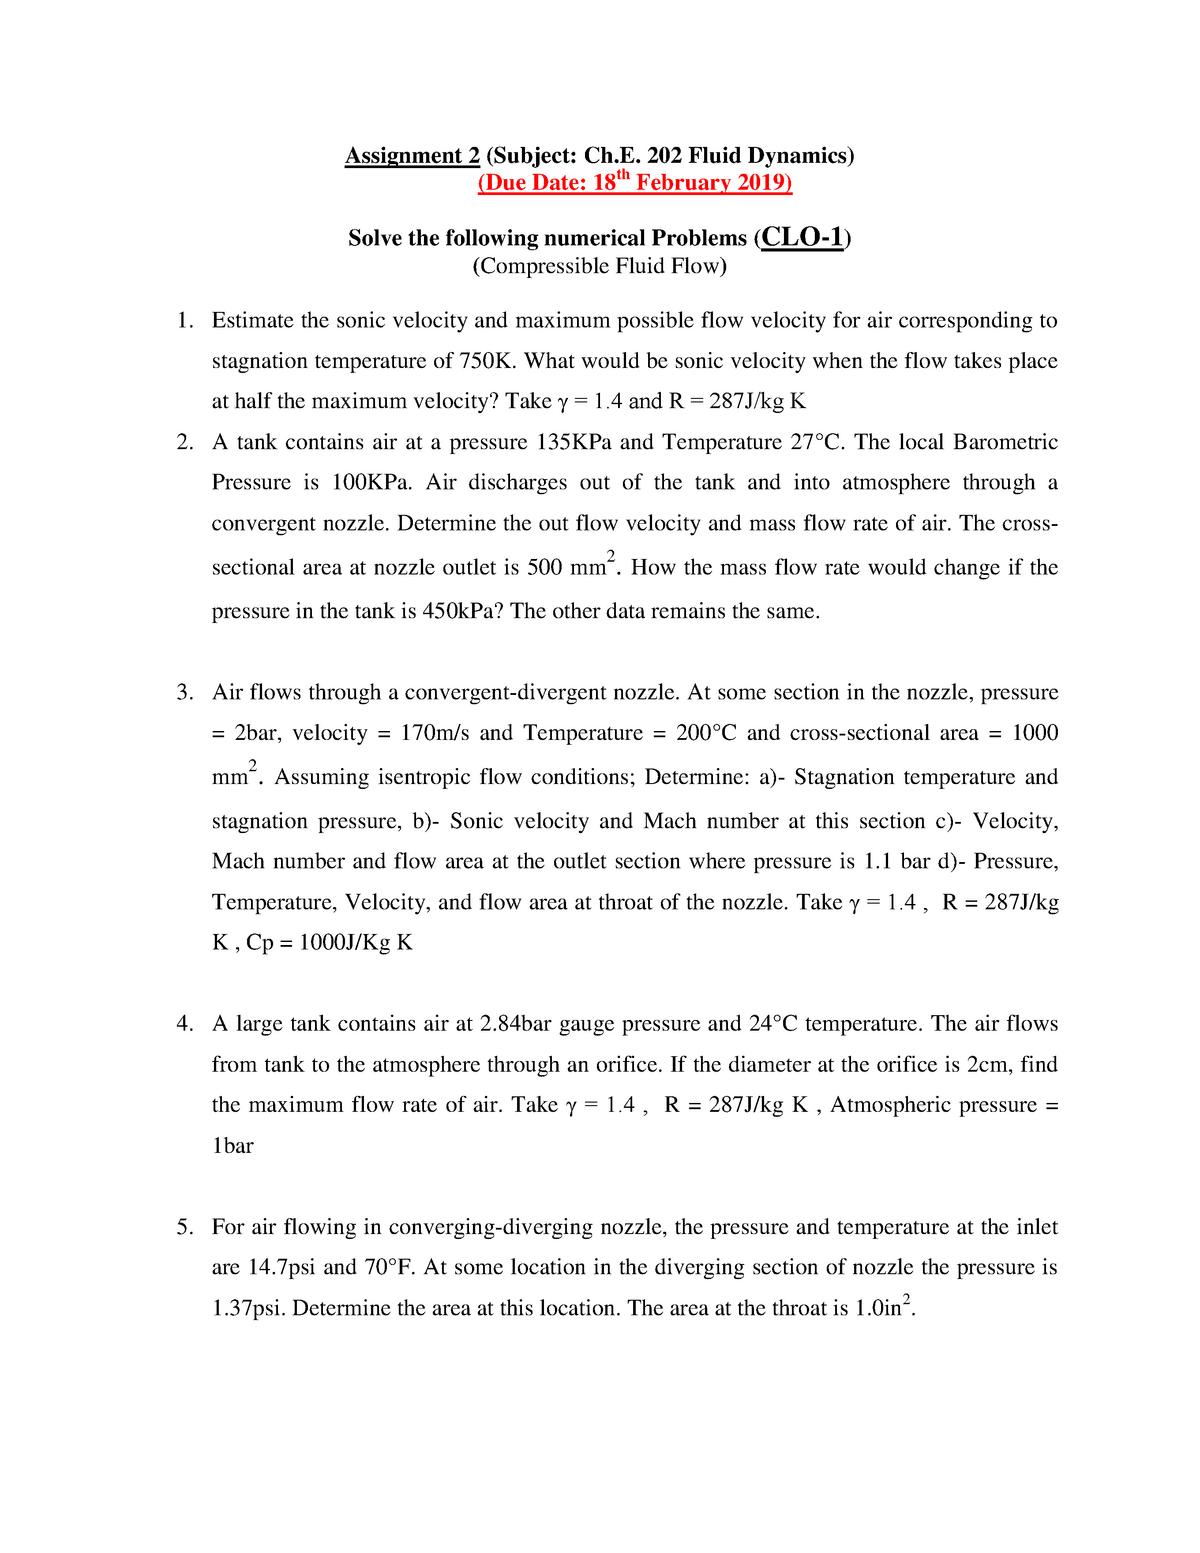 Assignment 2 (Ch E  202) - Che 202: Fluid Dynamics - StuDocu